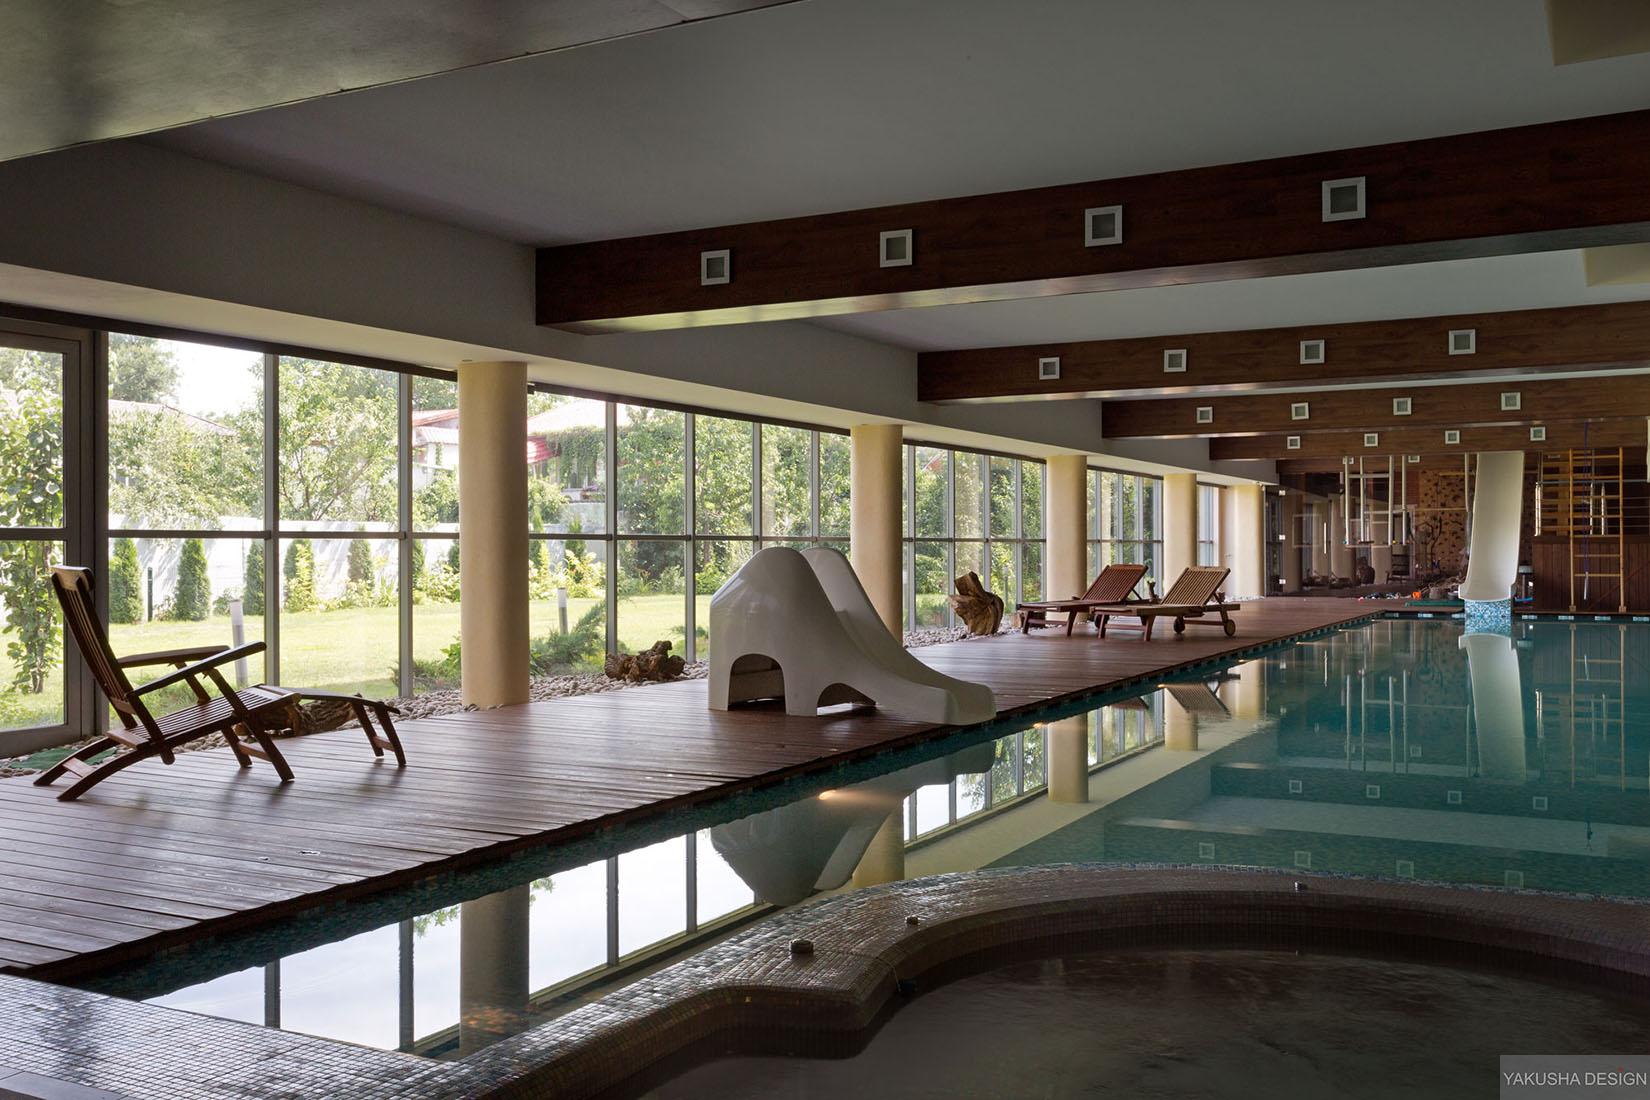 Impressive Exposed Beam Indoor Swimming Pool With Garden Views Daytime Interior Design Ideas